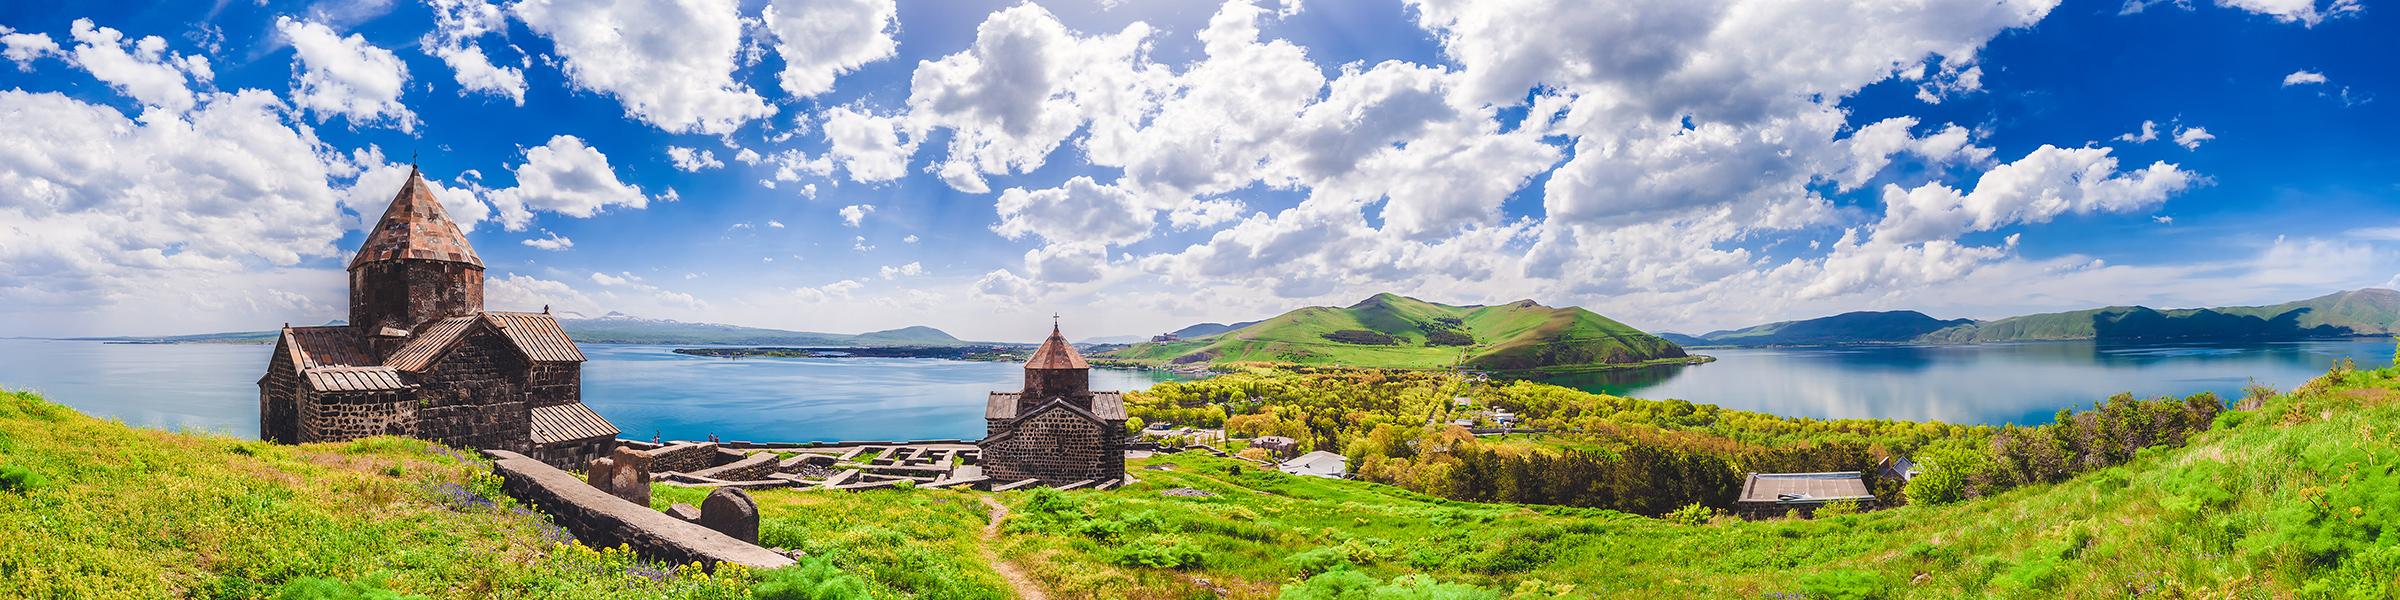 Armenia Lake Sevan Sevanavank